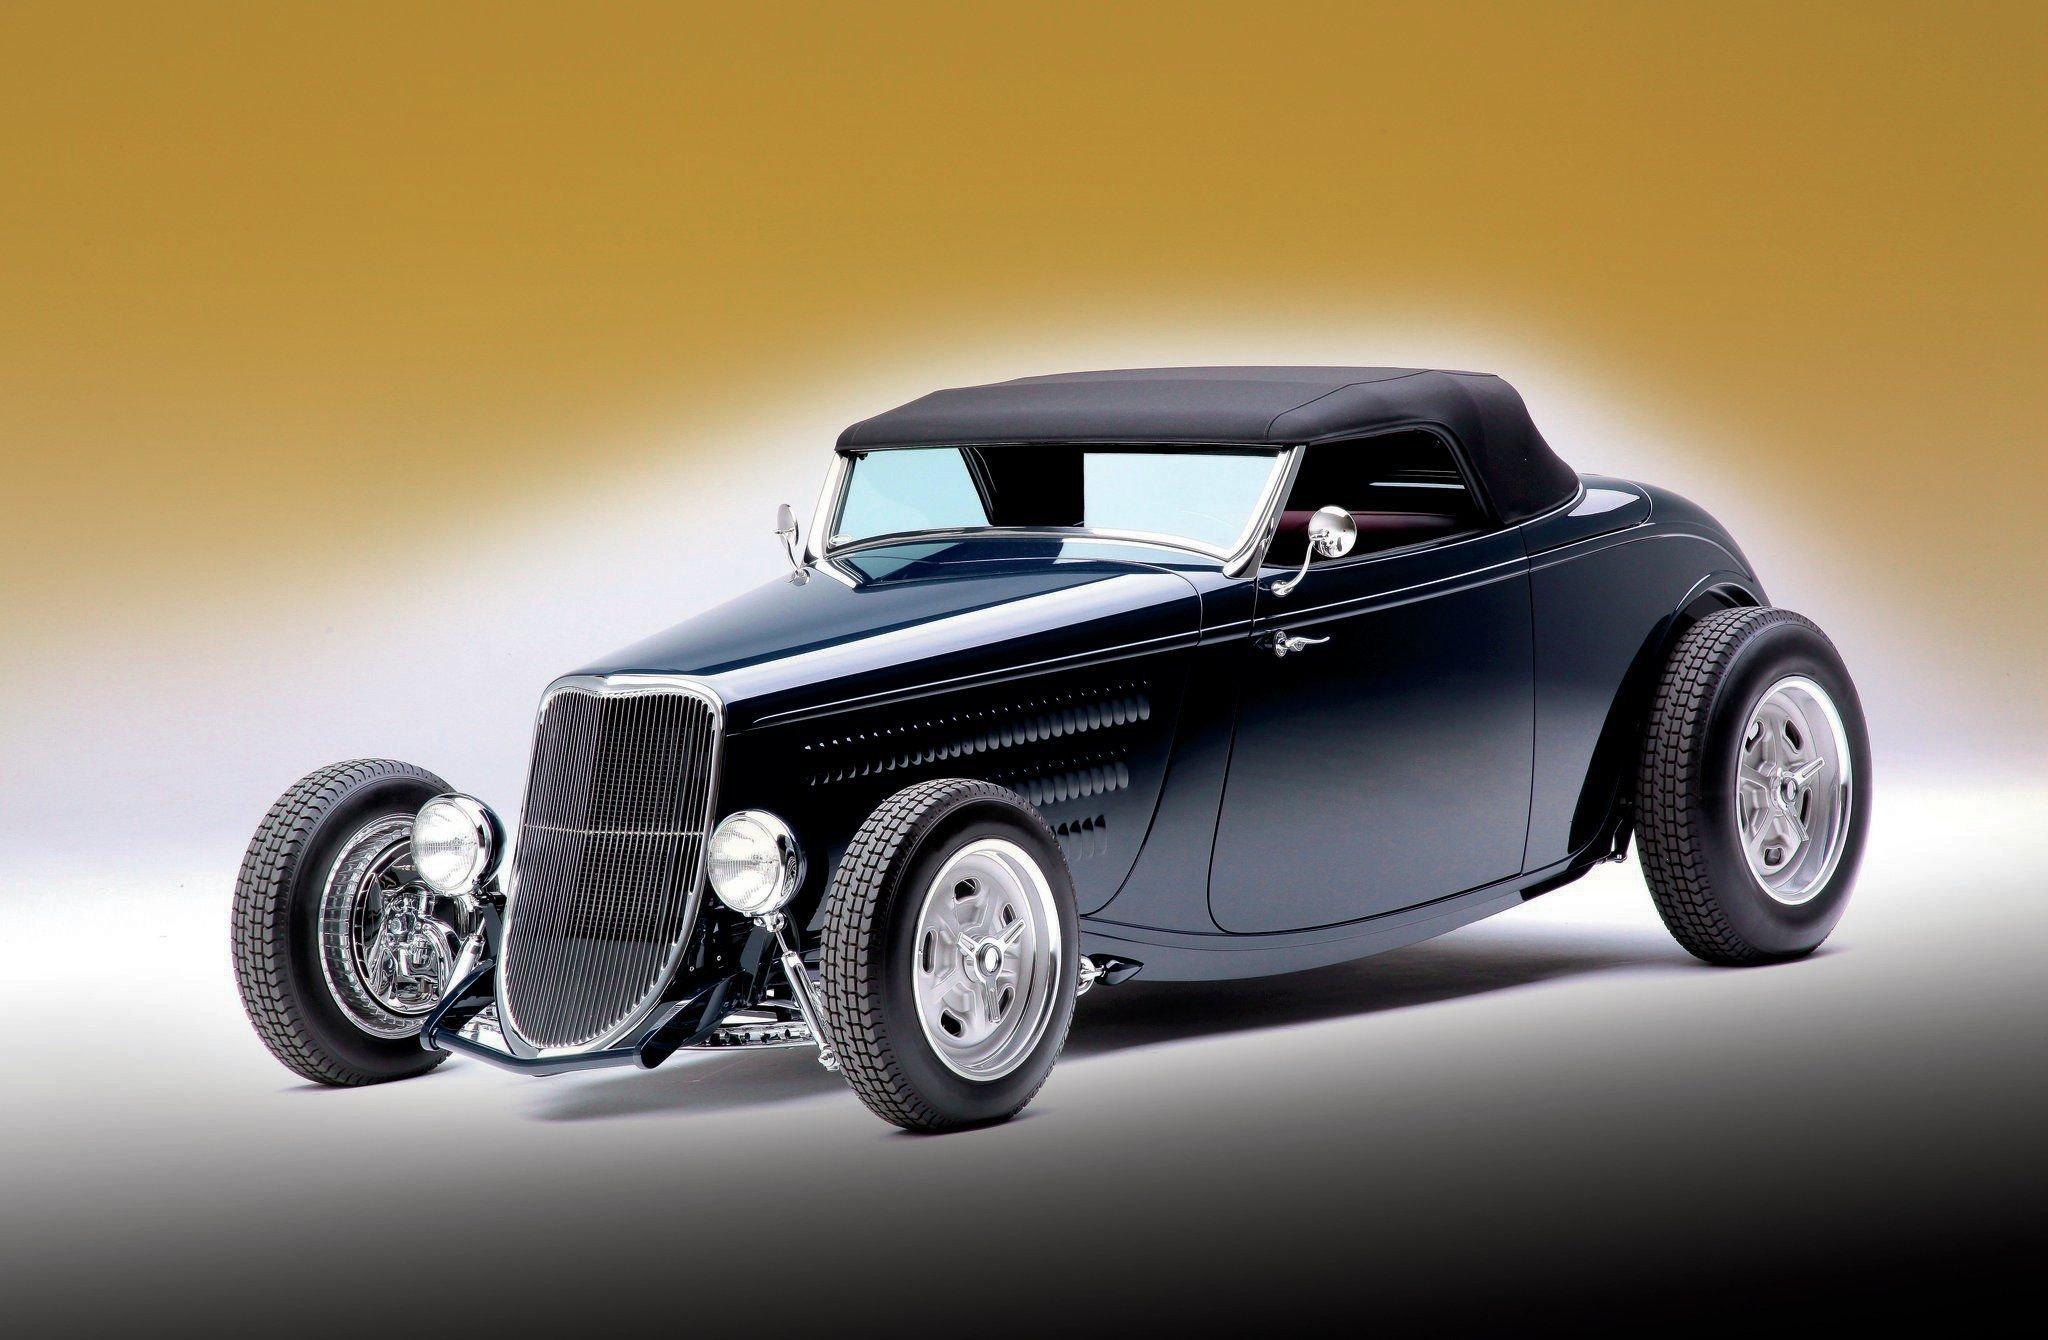 1933 Ford Roadster-01 wallpaper